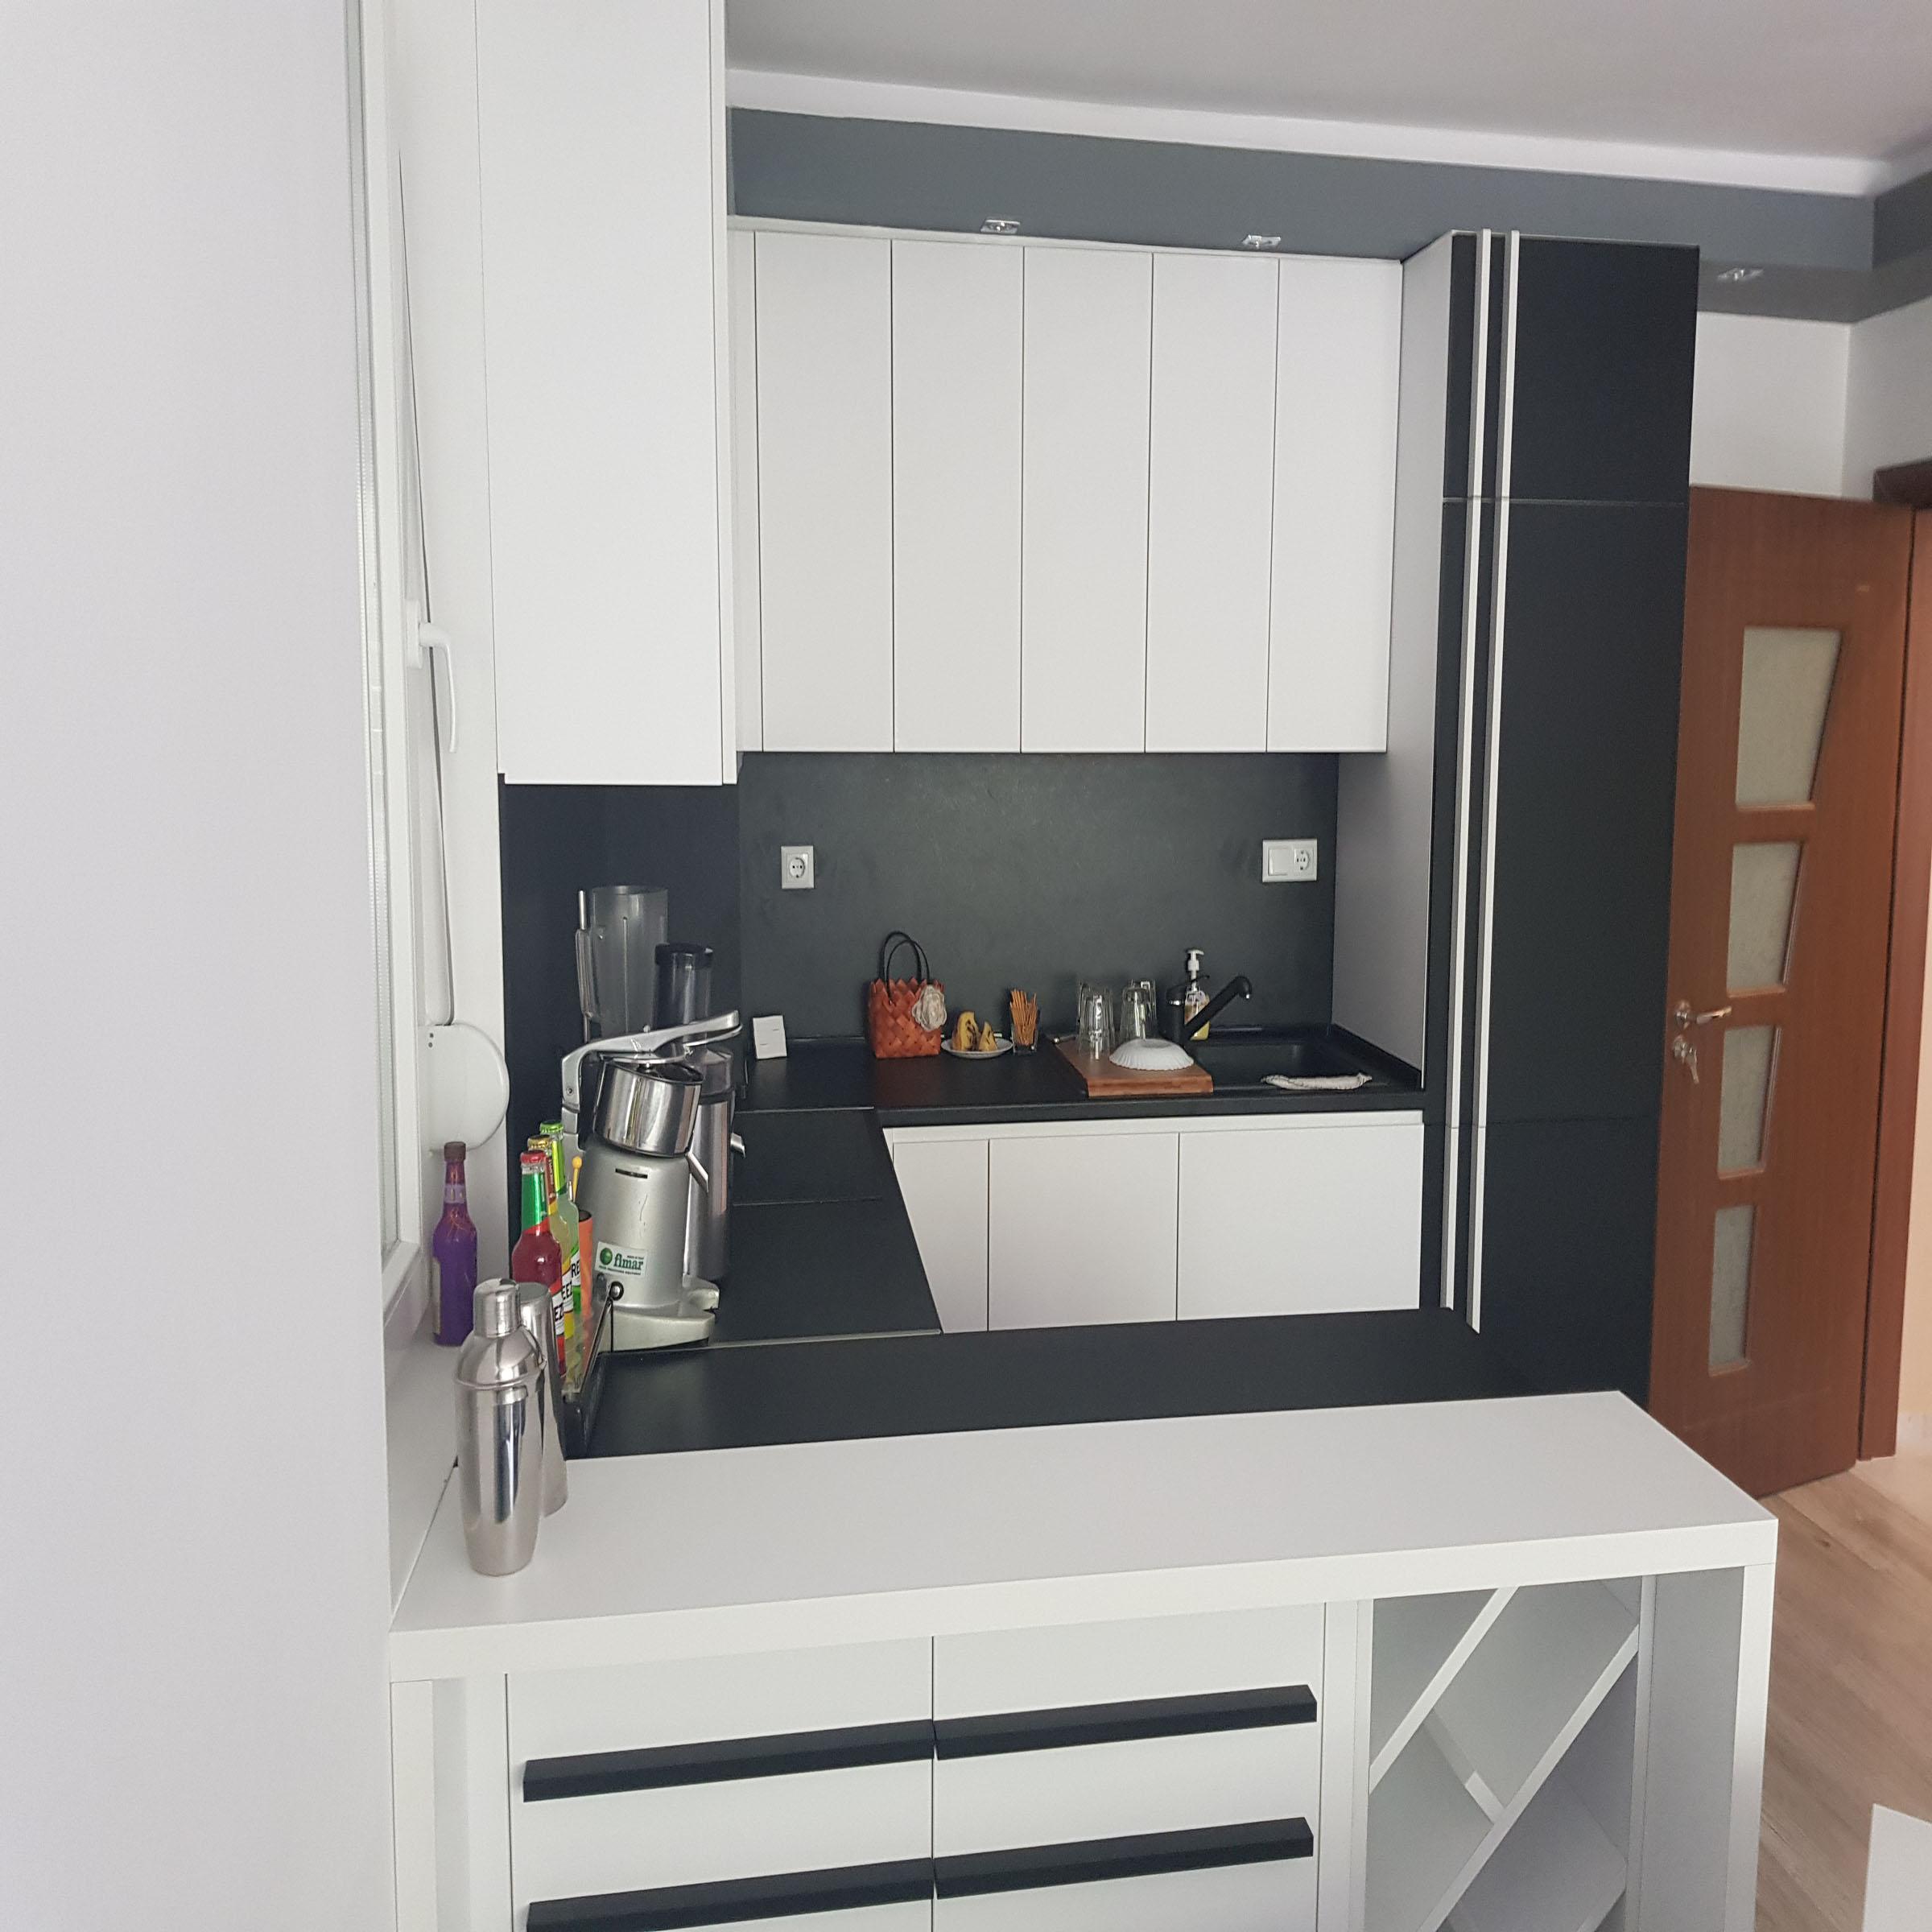 Кухненско-обзавеждане